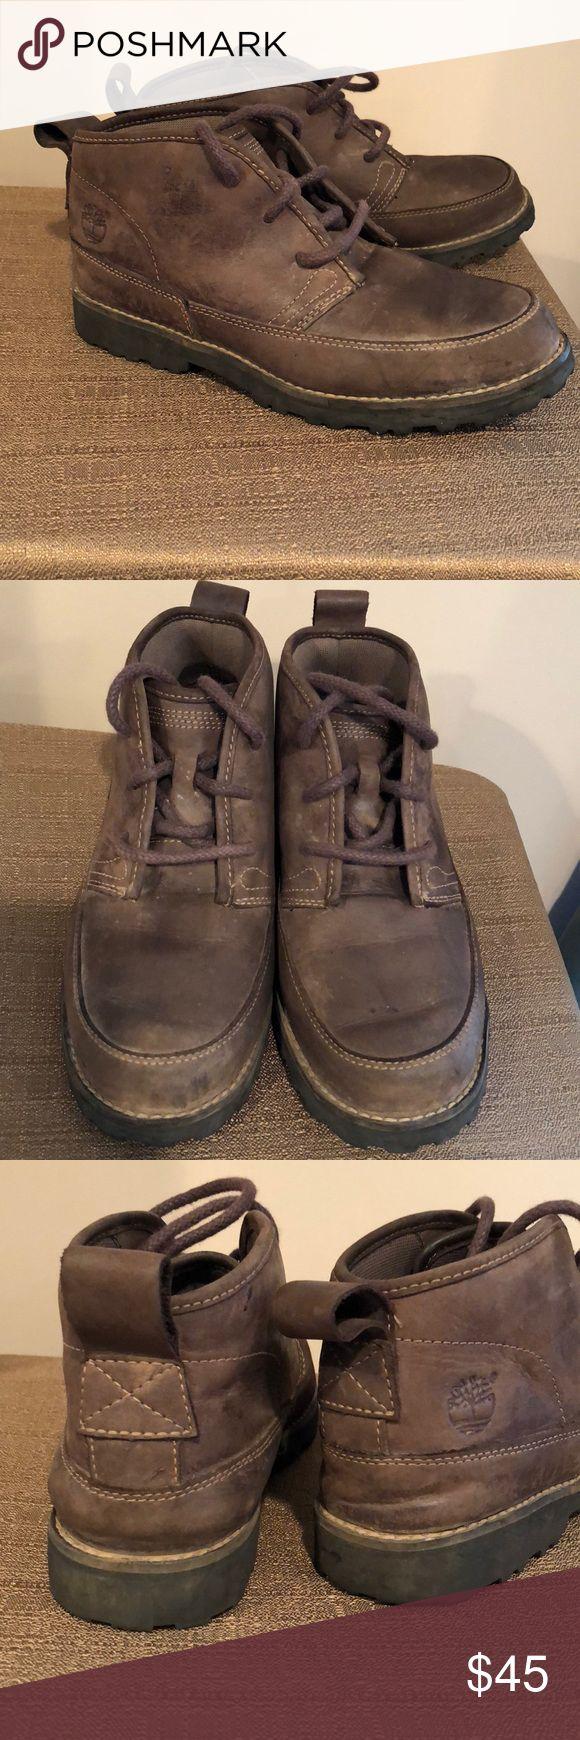 TIMBERLAND EARTHKEEPERS BOOTS 5 Boys TIMBERLAND EARTHKEEPERS BOOTS 5 Boys Timberland Shoes Boots